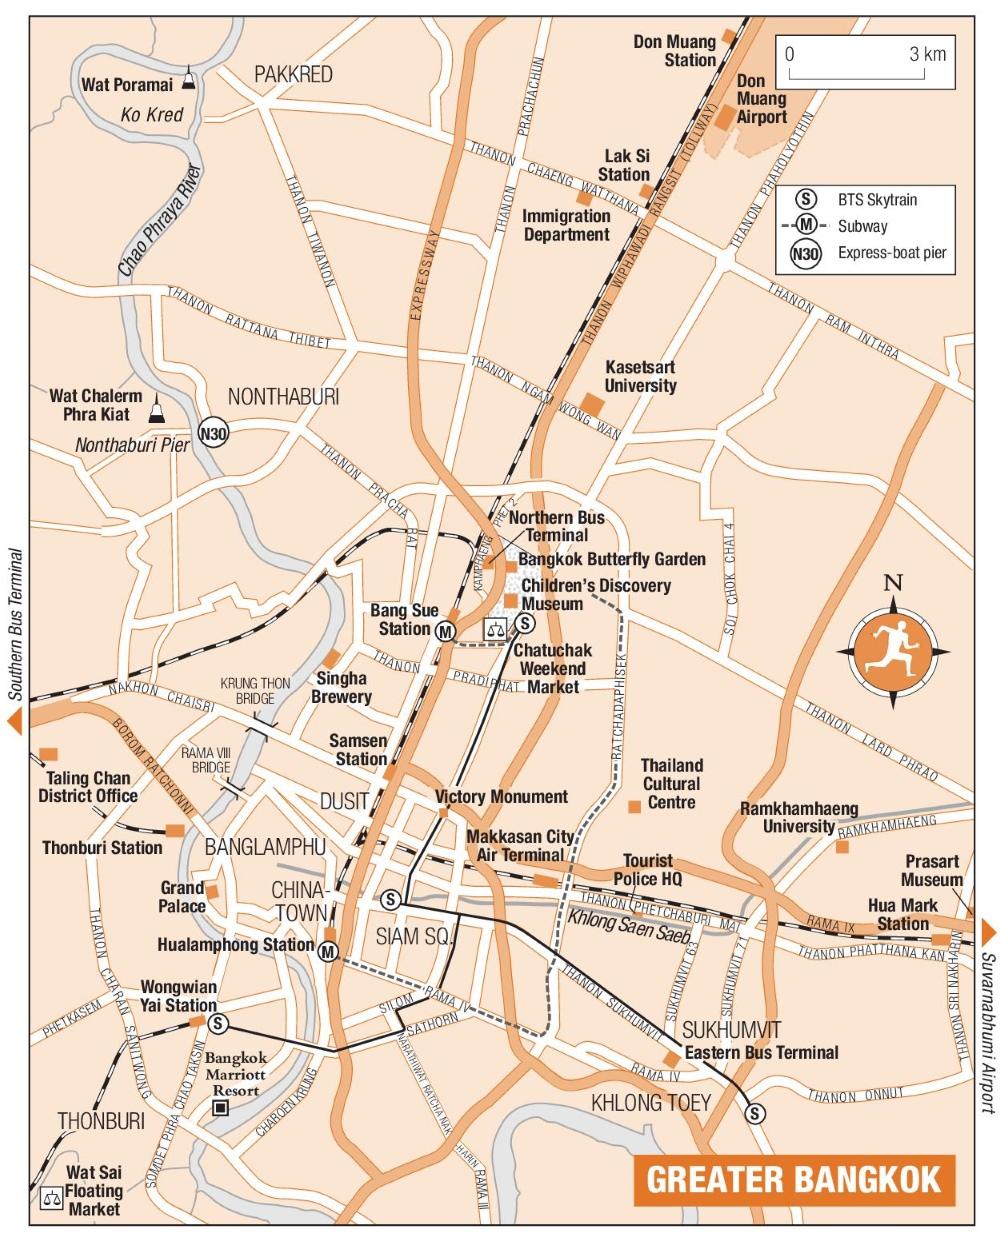 Greater Bangkok map